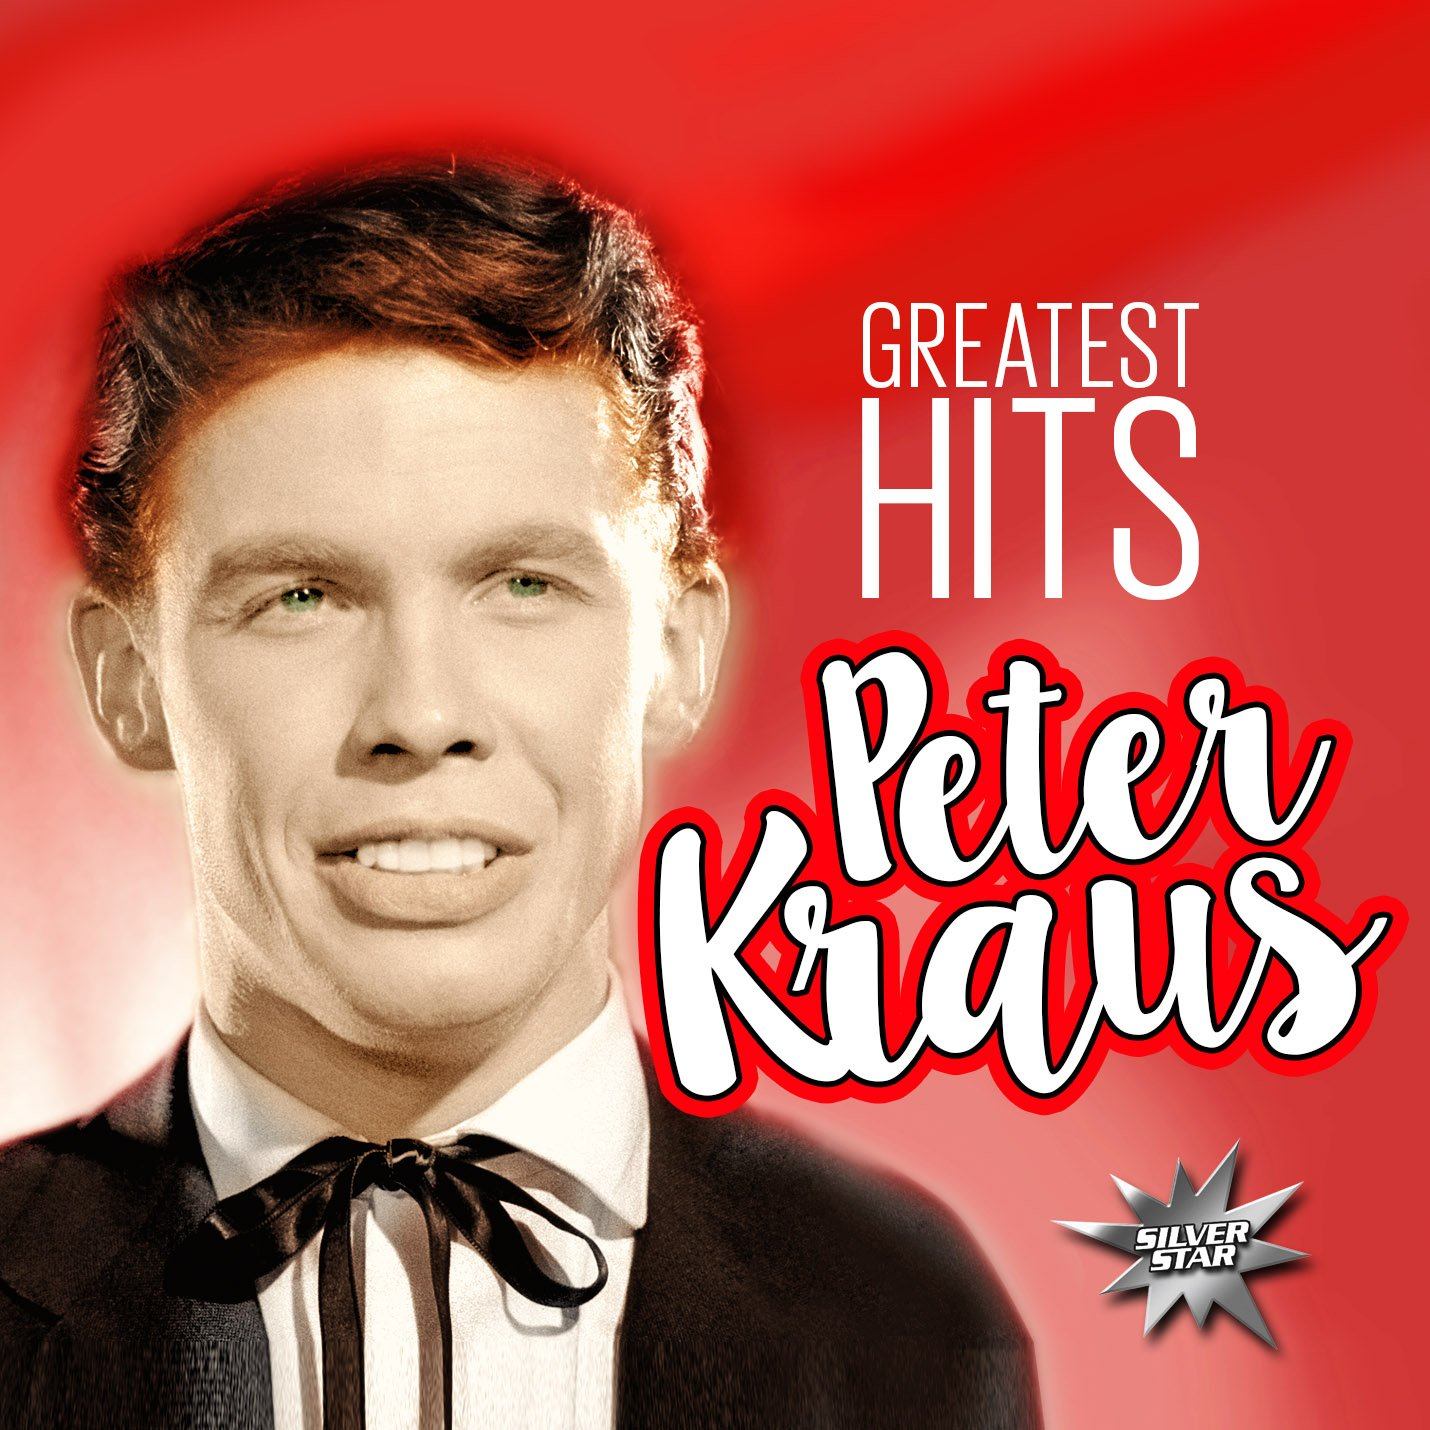 Peter Kraus. Greatest Hits